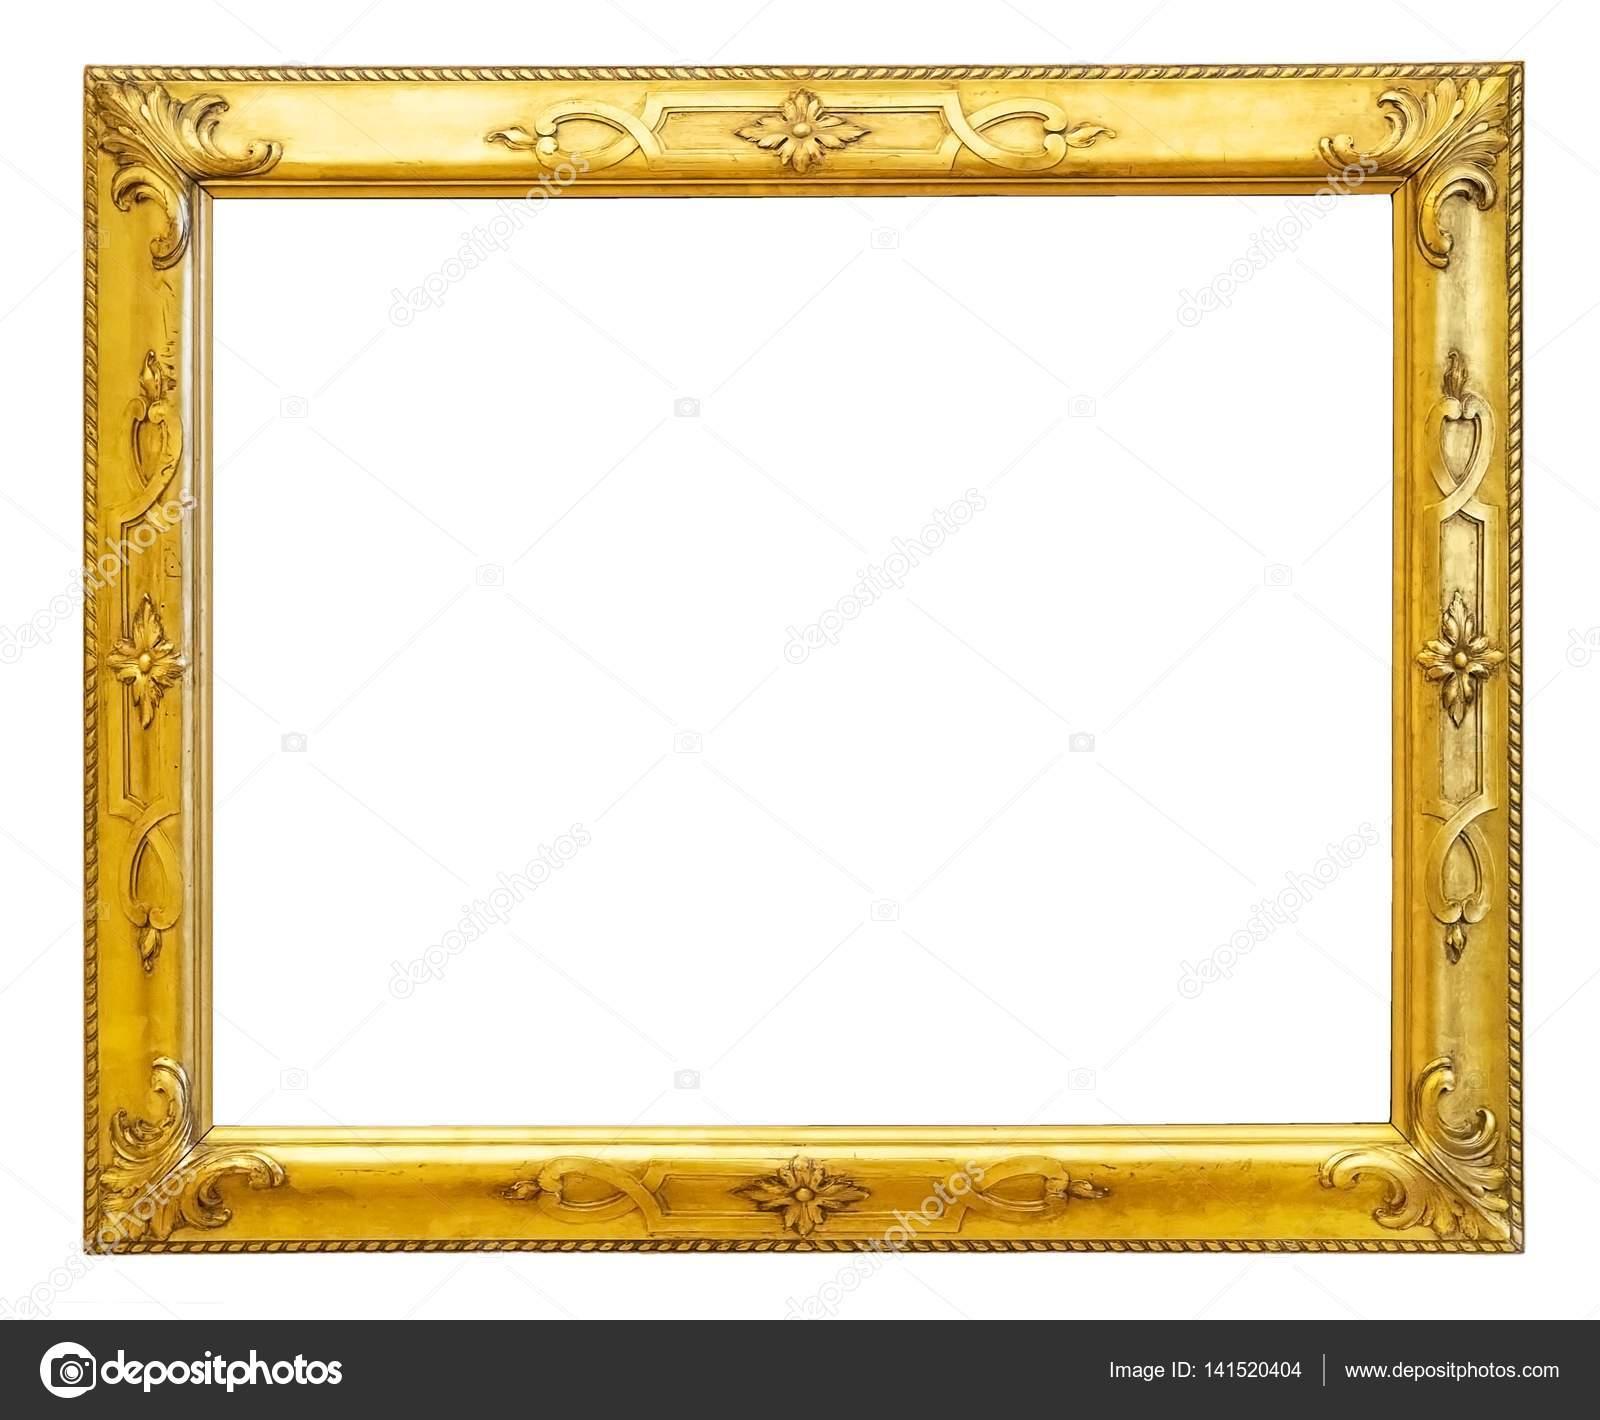 Tolle wooden pictures frames zeitgen ssisch for Obi cornici per quadri